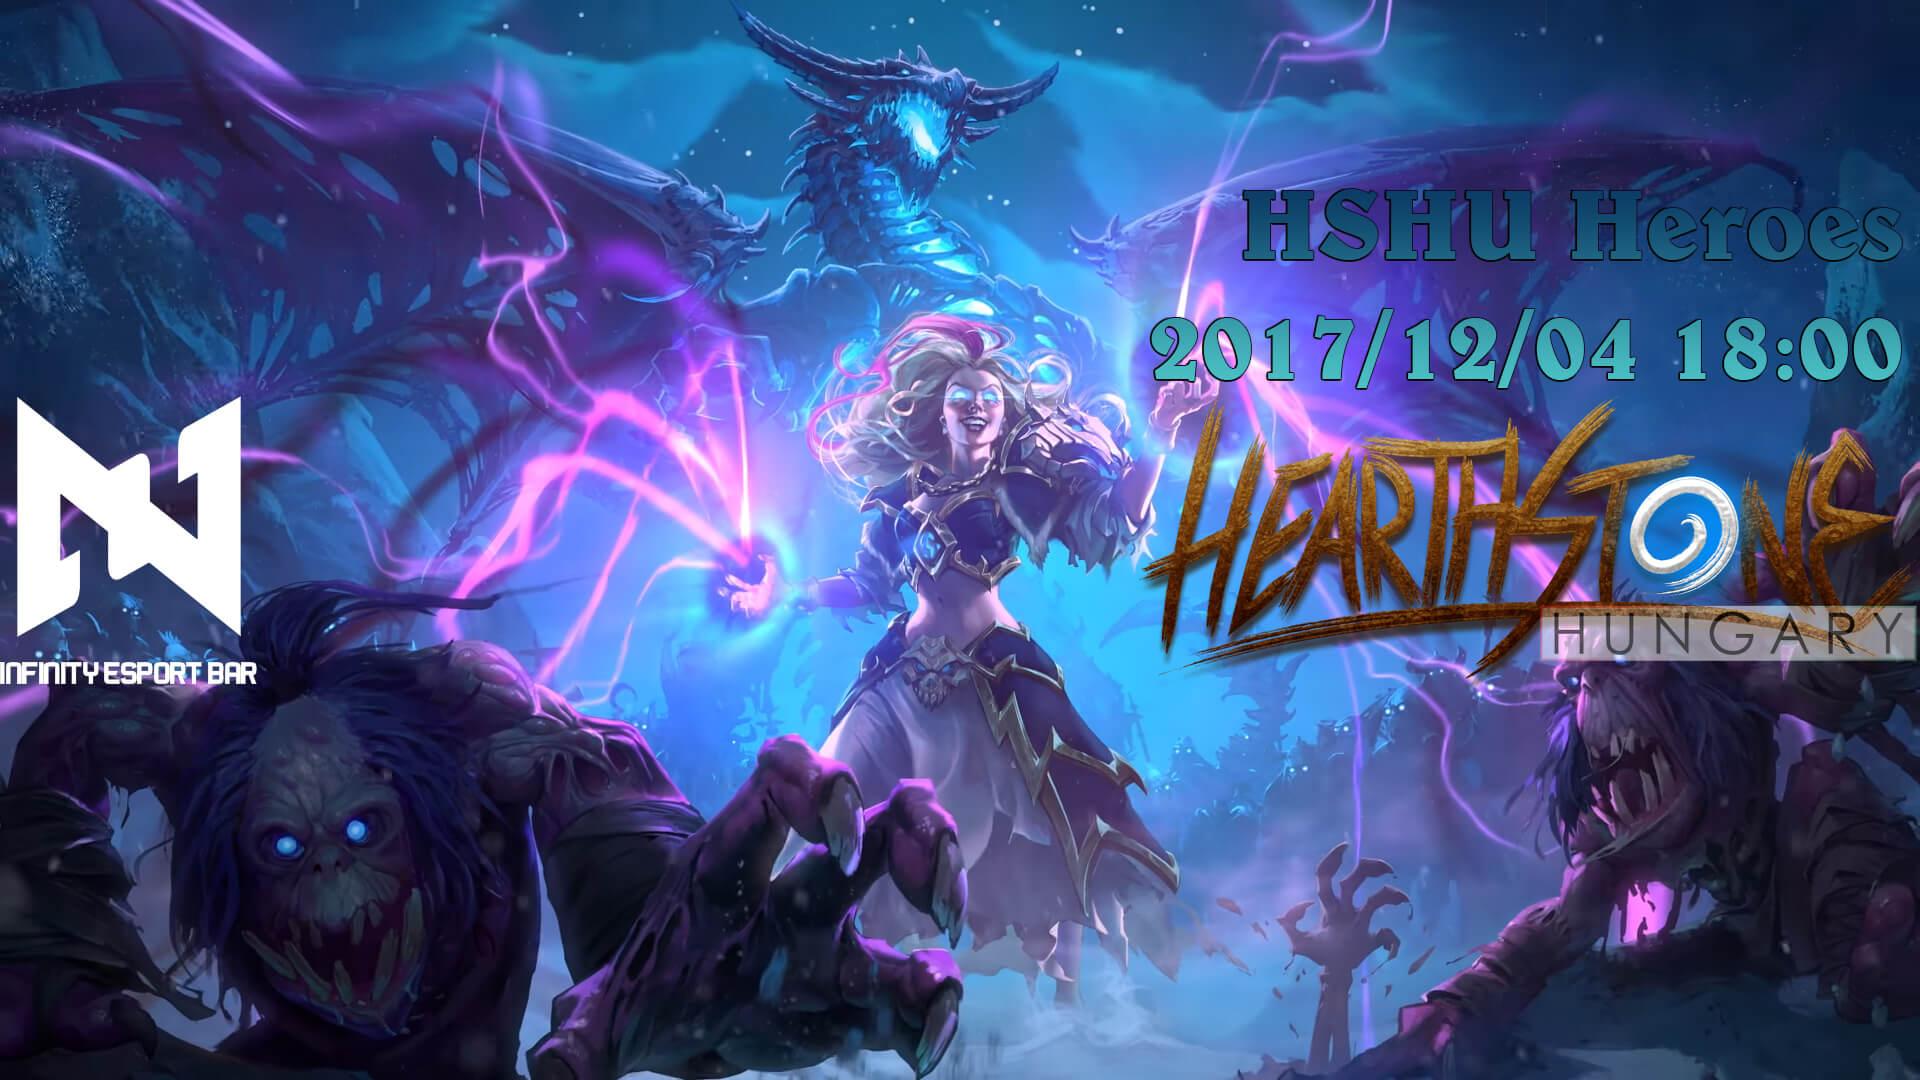 Hearthstone Hungary Heroes versenyek